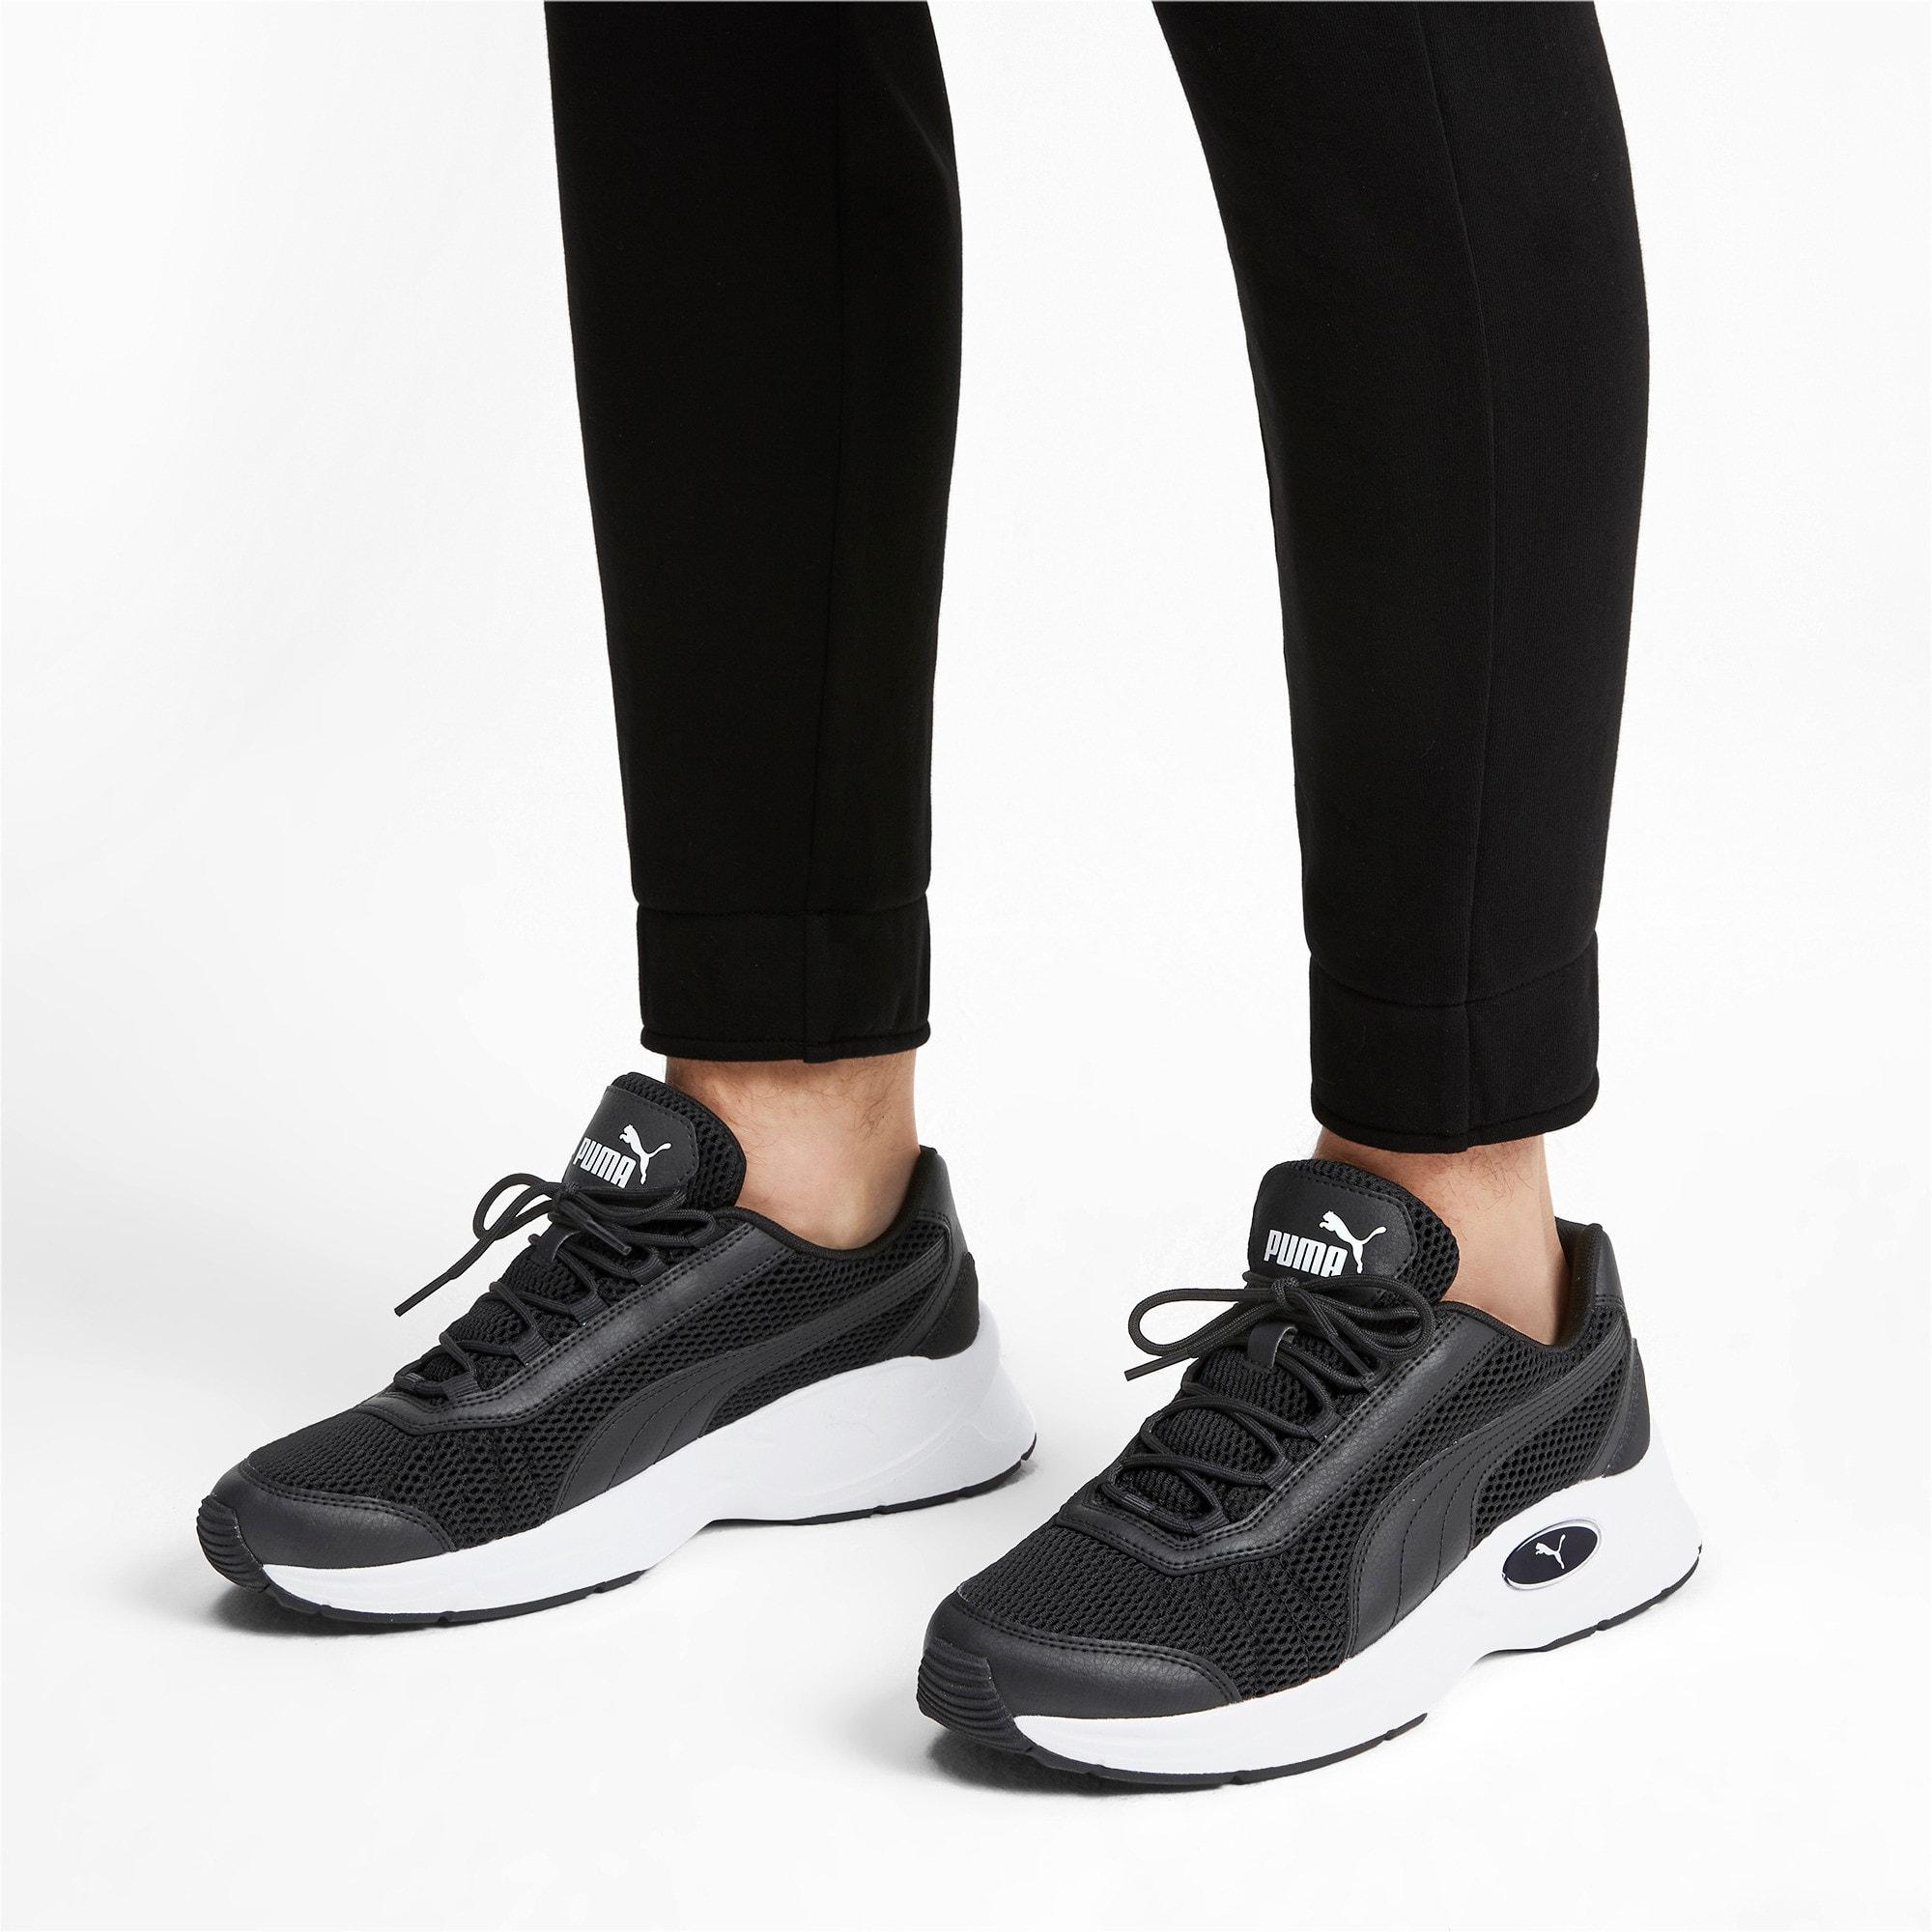 Thumbnail 2 of Nucleus Training Shoes, Puma Black-Puma Black, medium-IND